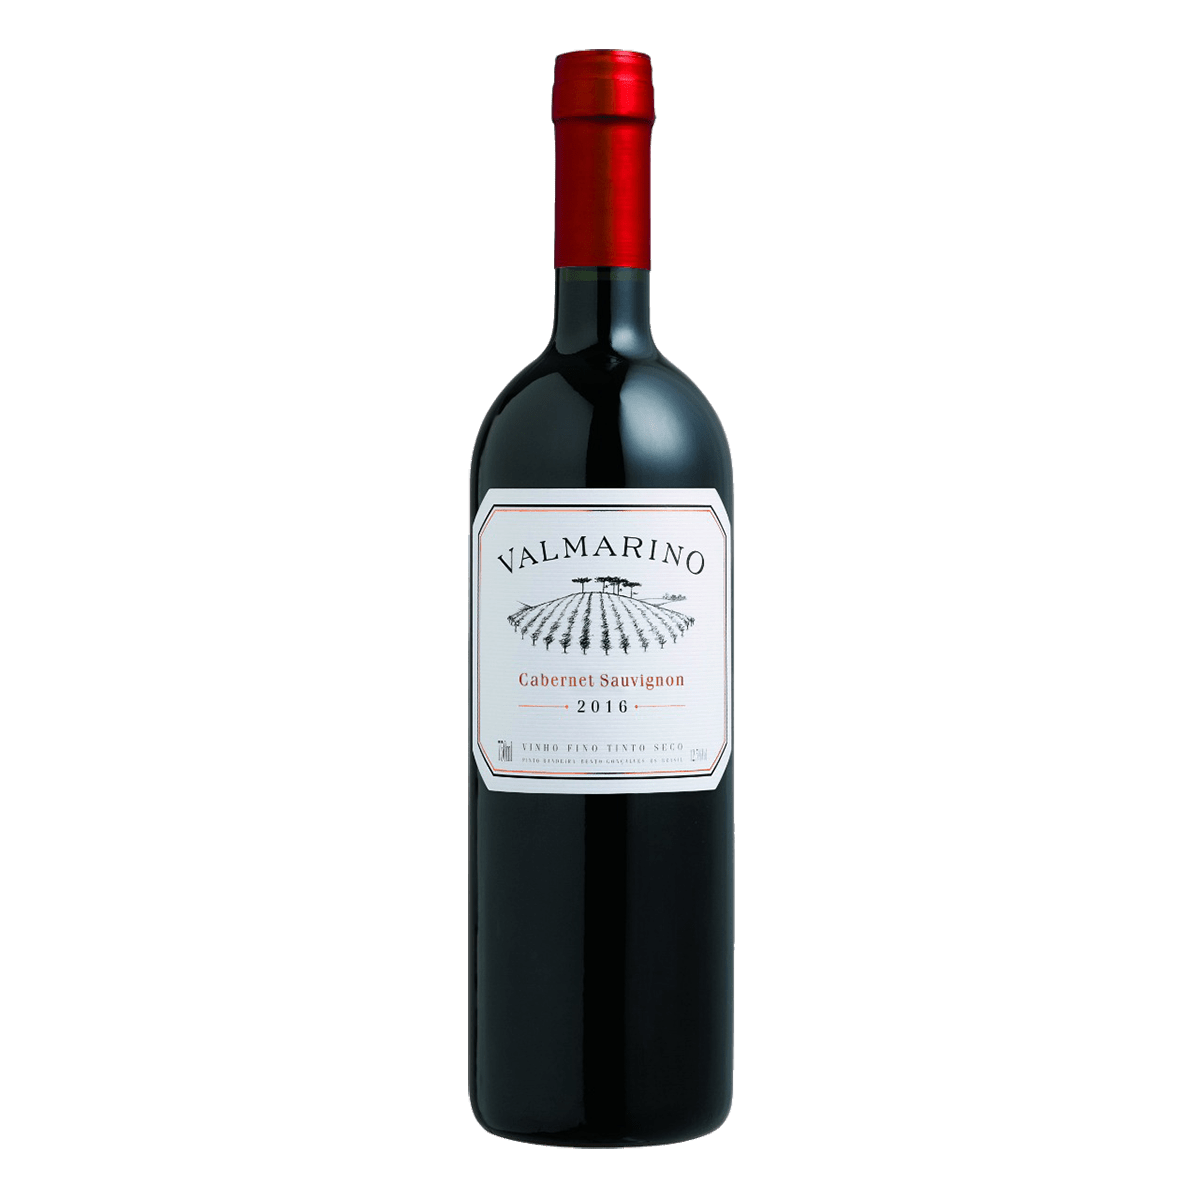 Vinho Valmarino Cabernet Sauvignon Tinto 750ml